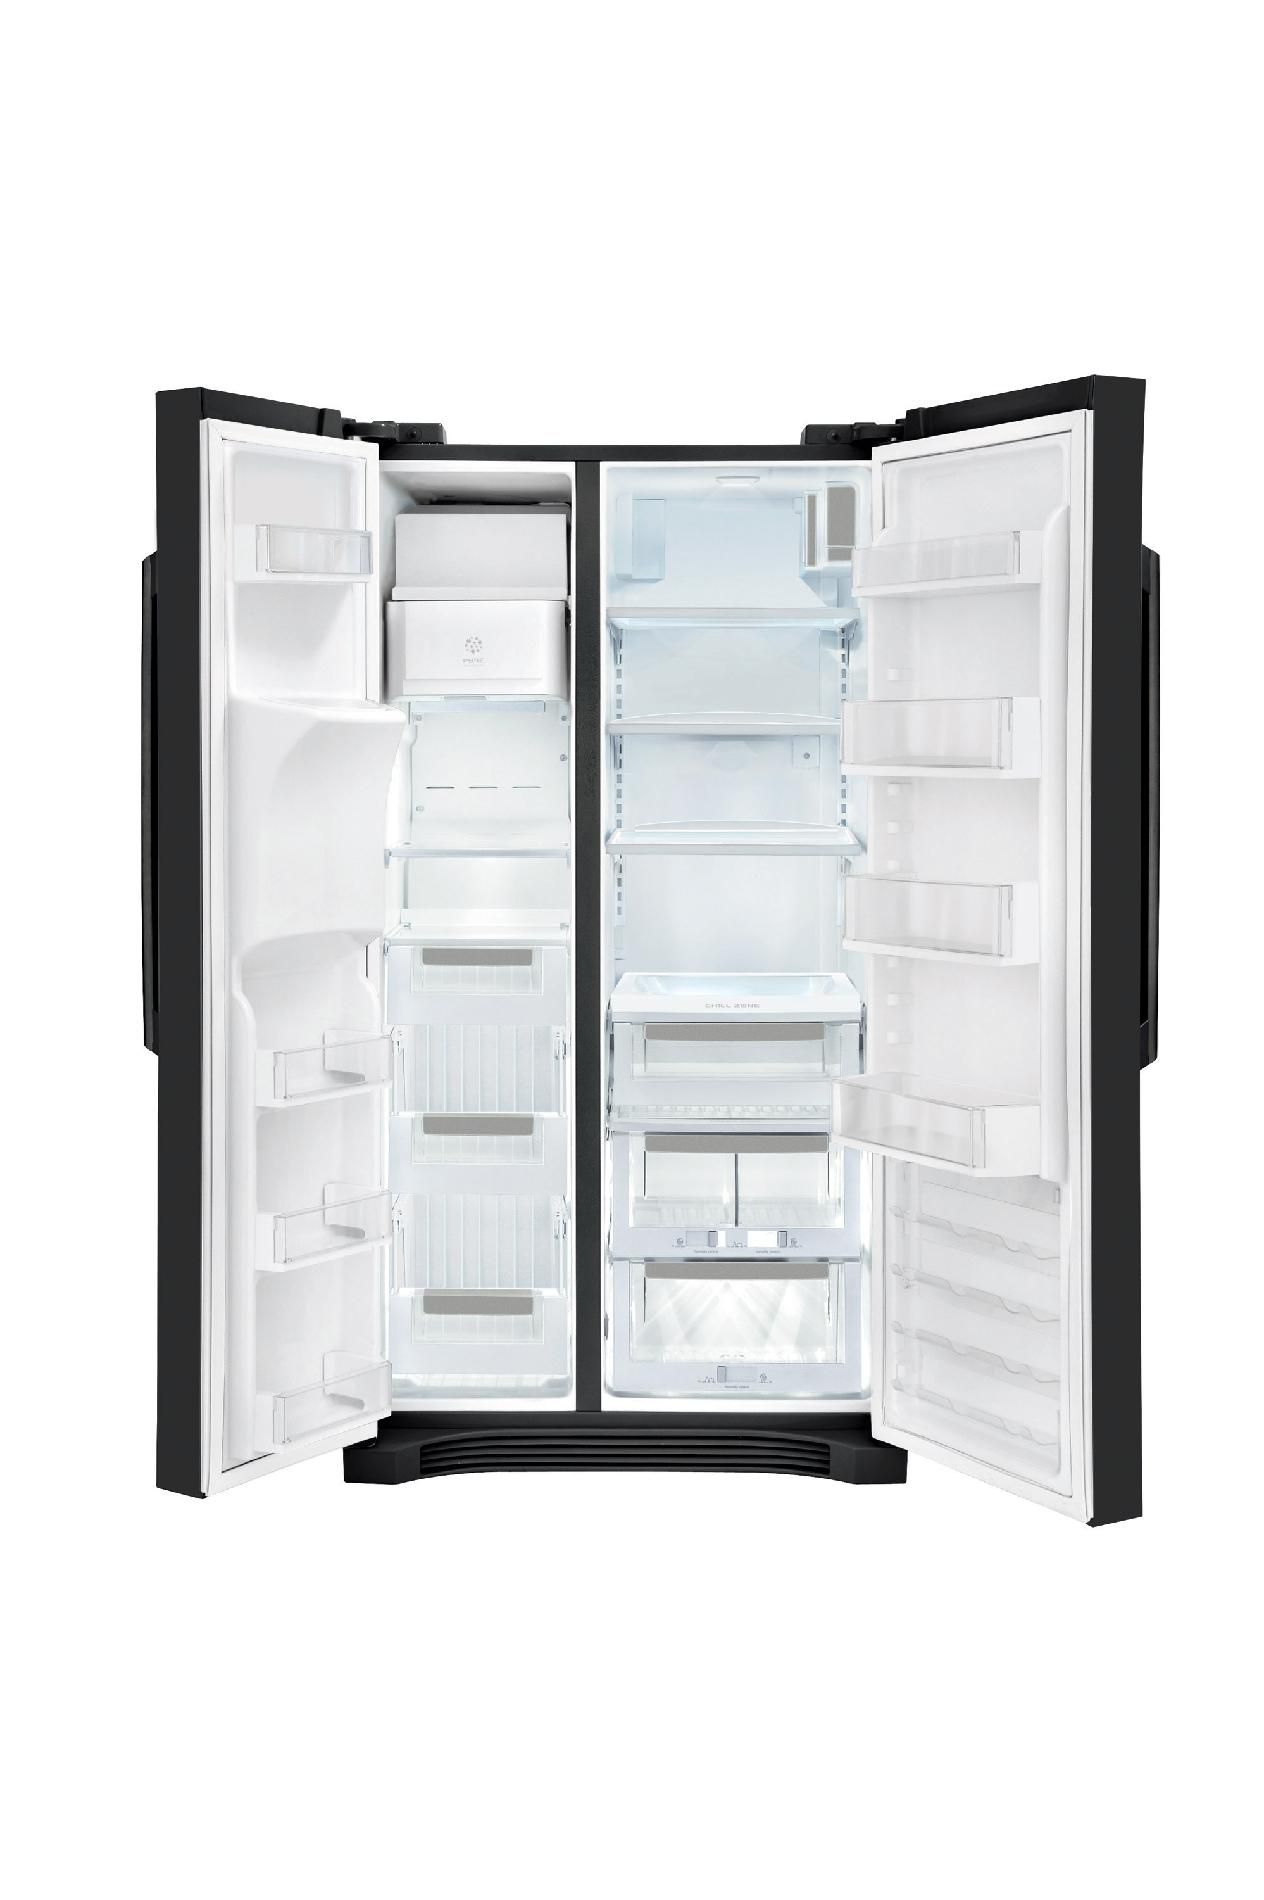 Electrolux 22.6 cu. ft. Counter-Depth Side-By-Side Refrigerator - Black